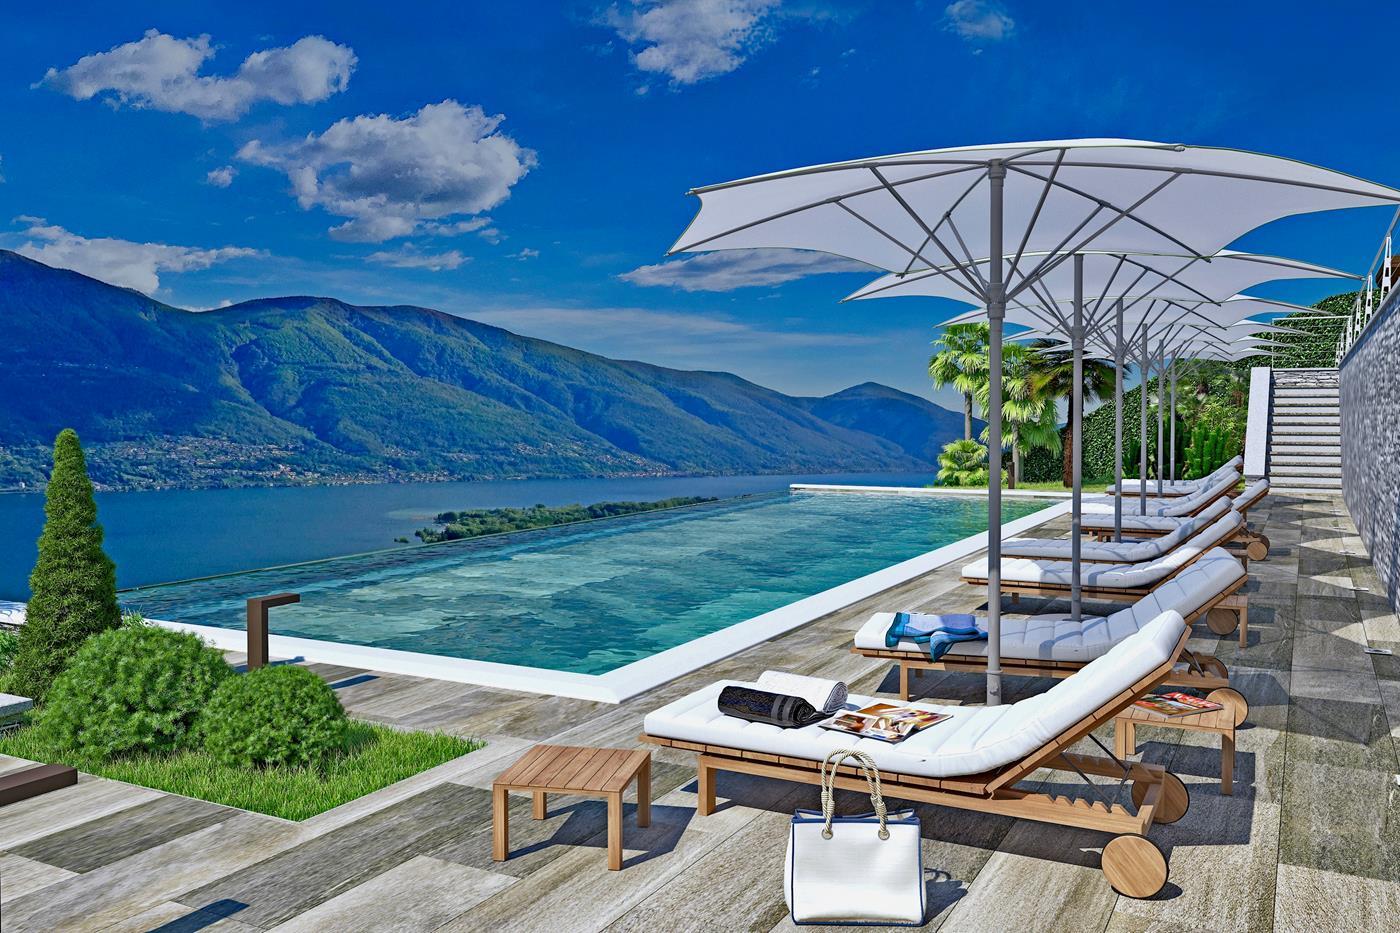 Grosser Aussenpool mit Panorama-Seeblick auf den Lago Maggiore